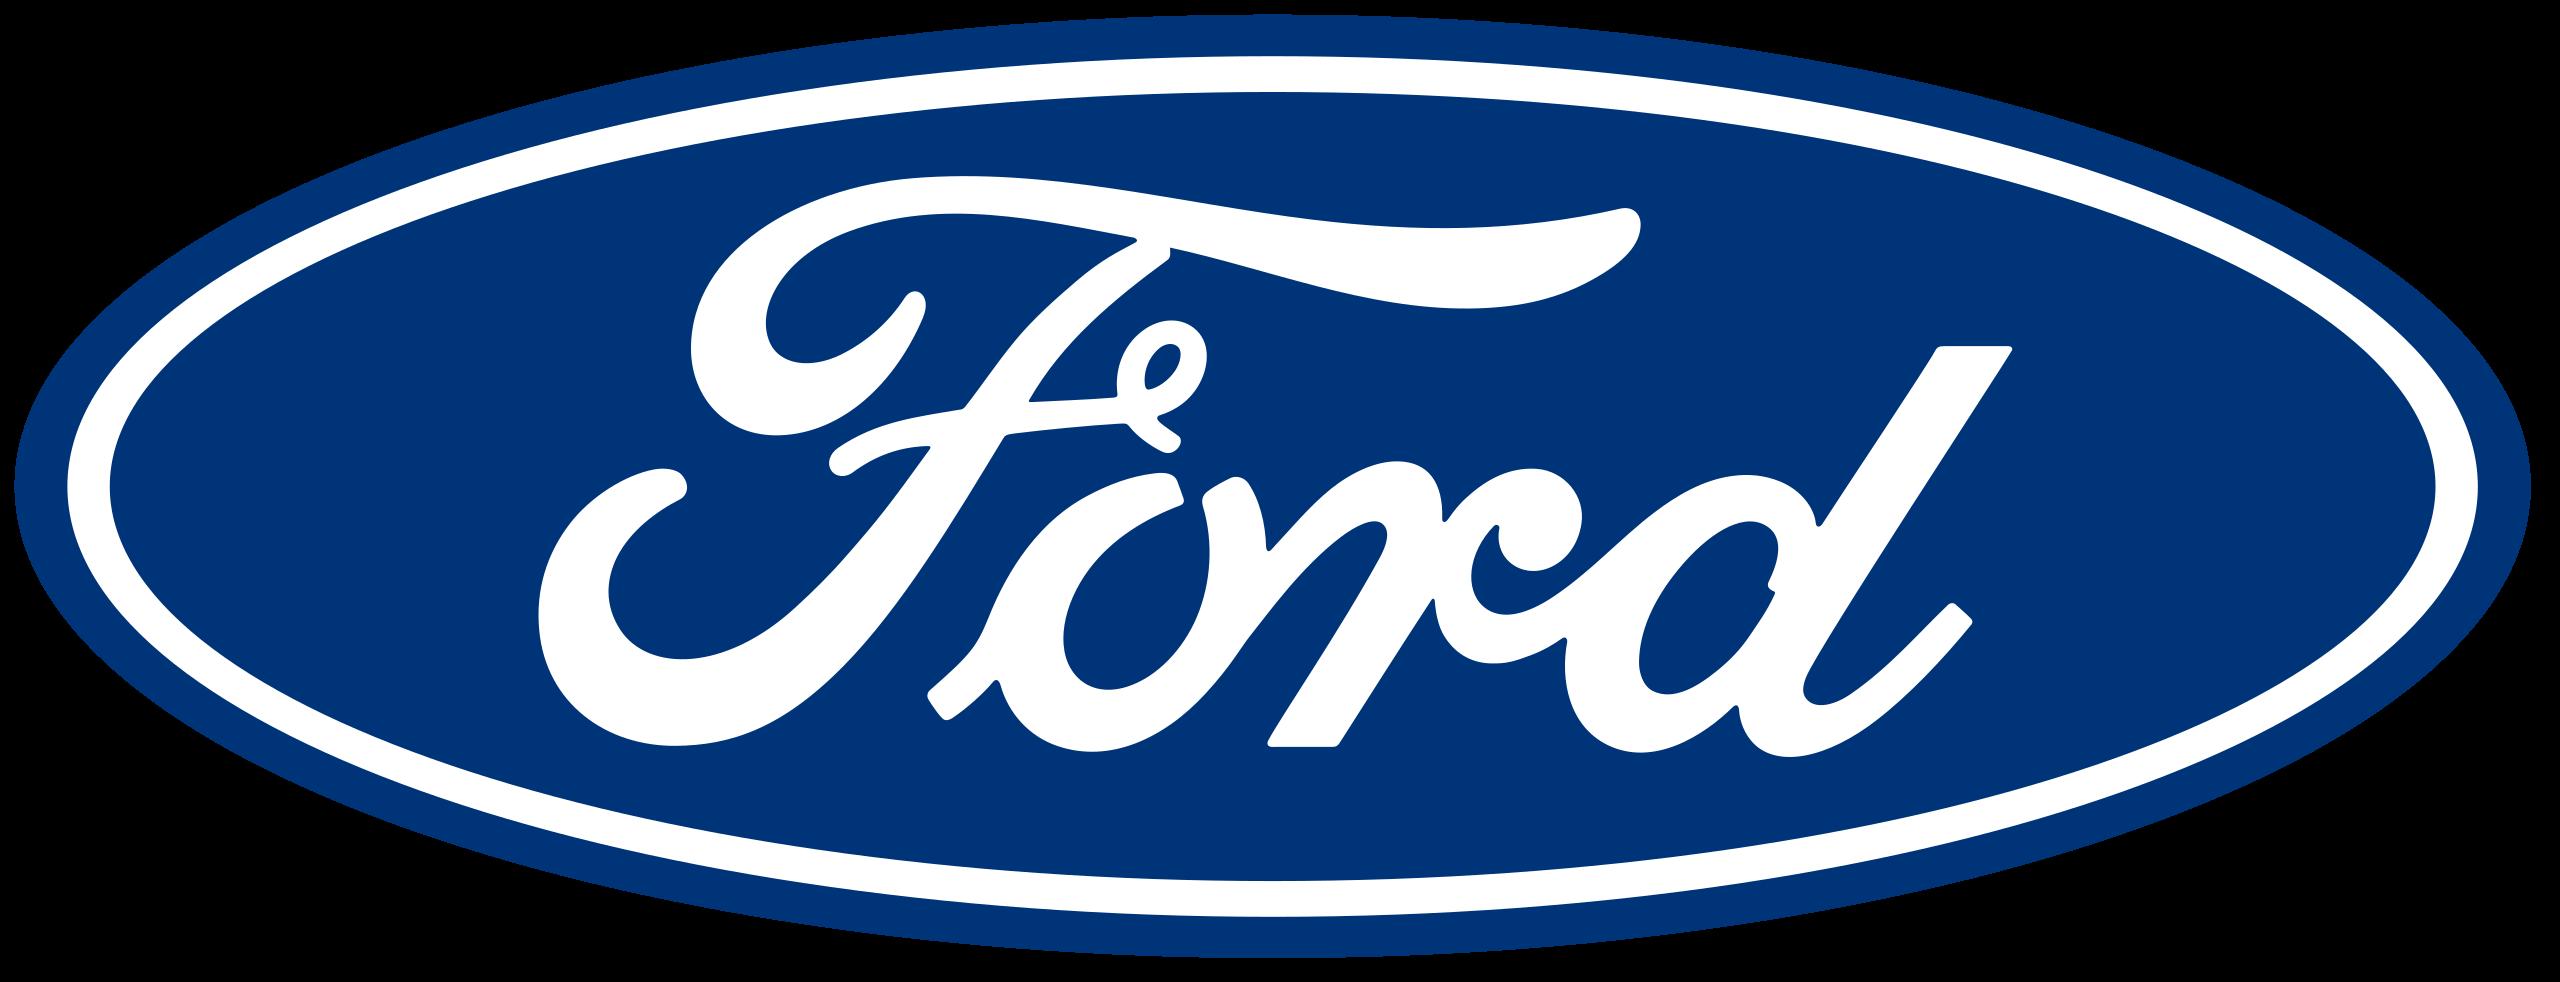 Ford_logo_flat